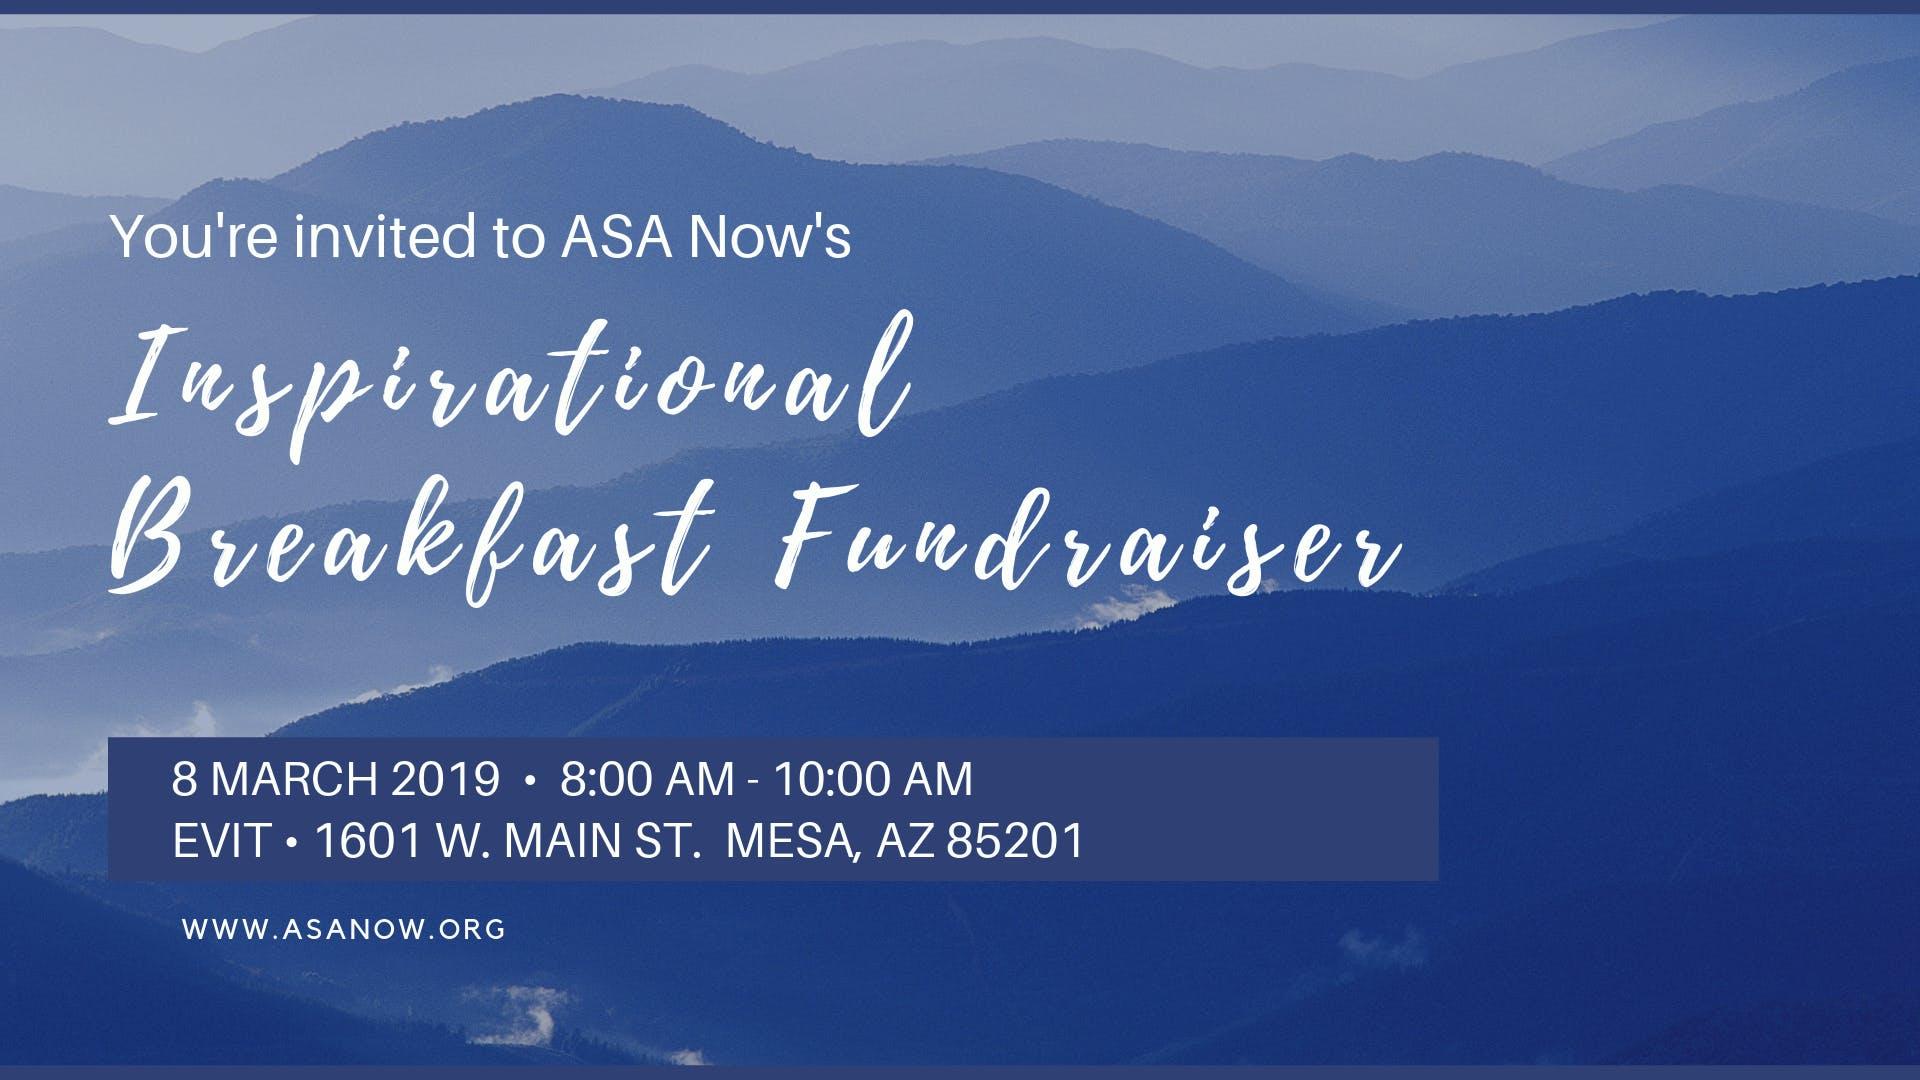 ASA Now Inspirational Breakfast Fundraiser